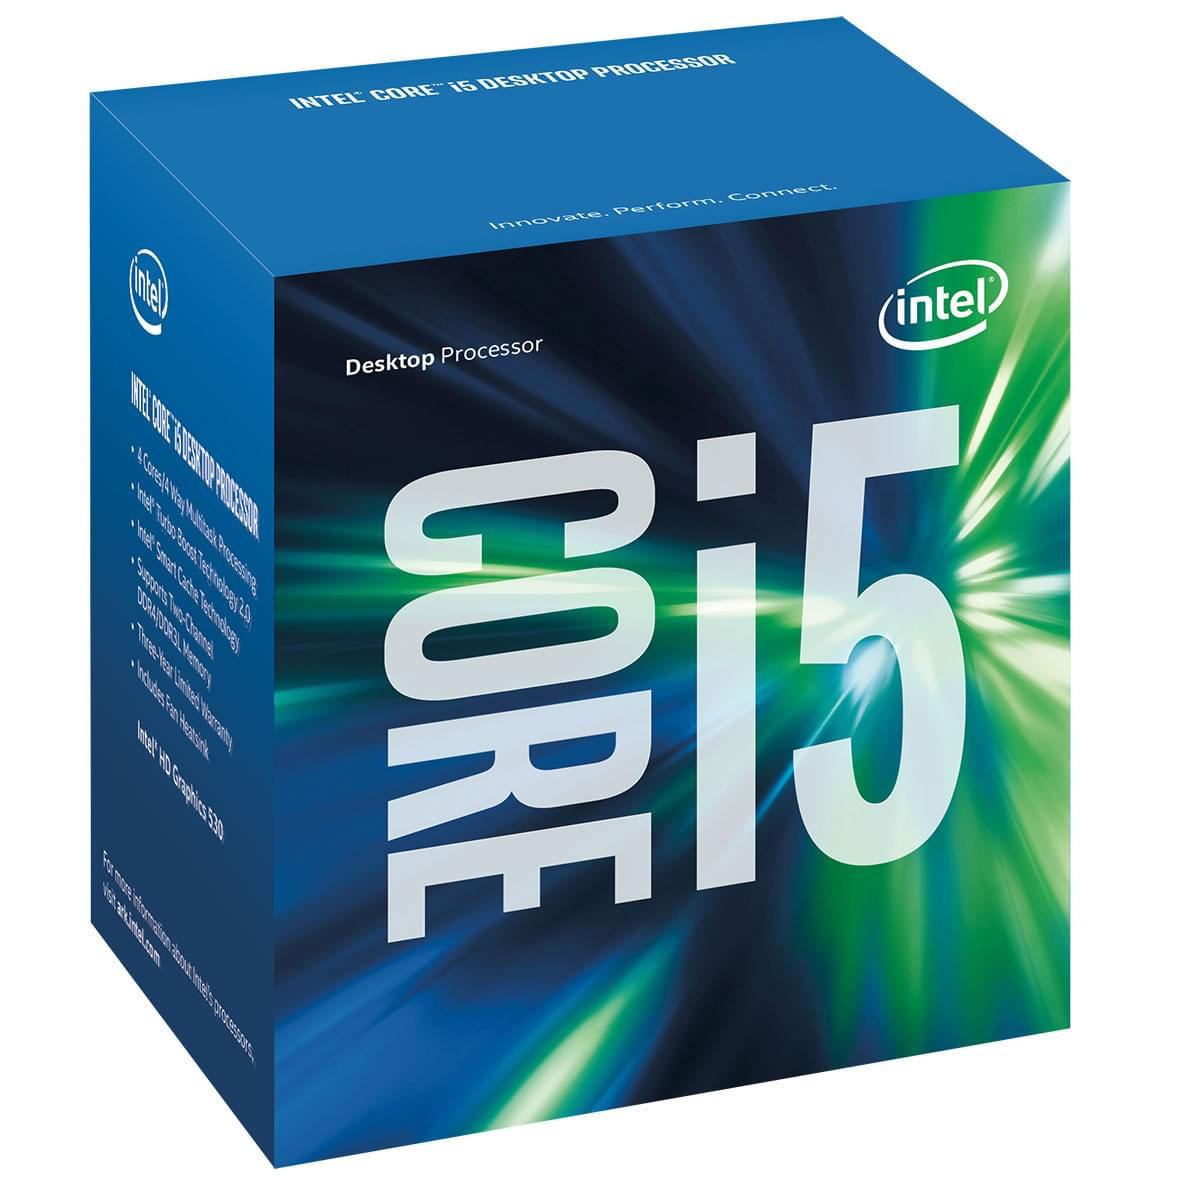 Processeur Intel Core i5 6400 - 2.7GHz - Gamer -  - 0